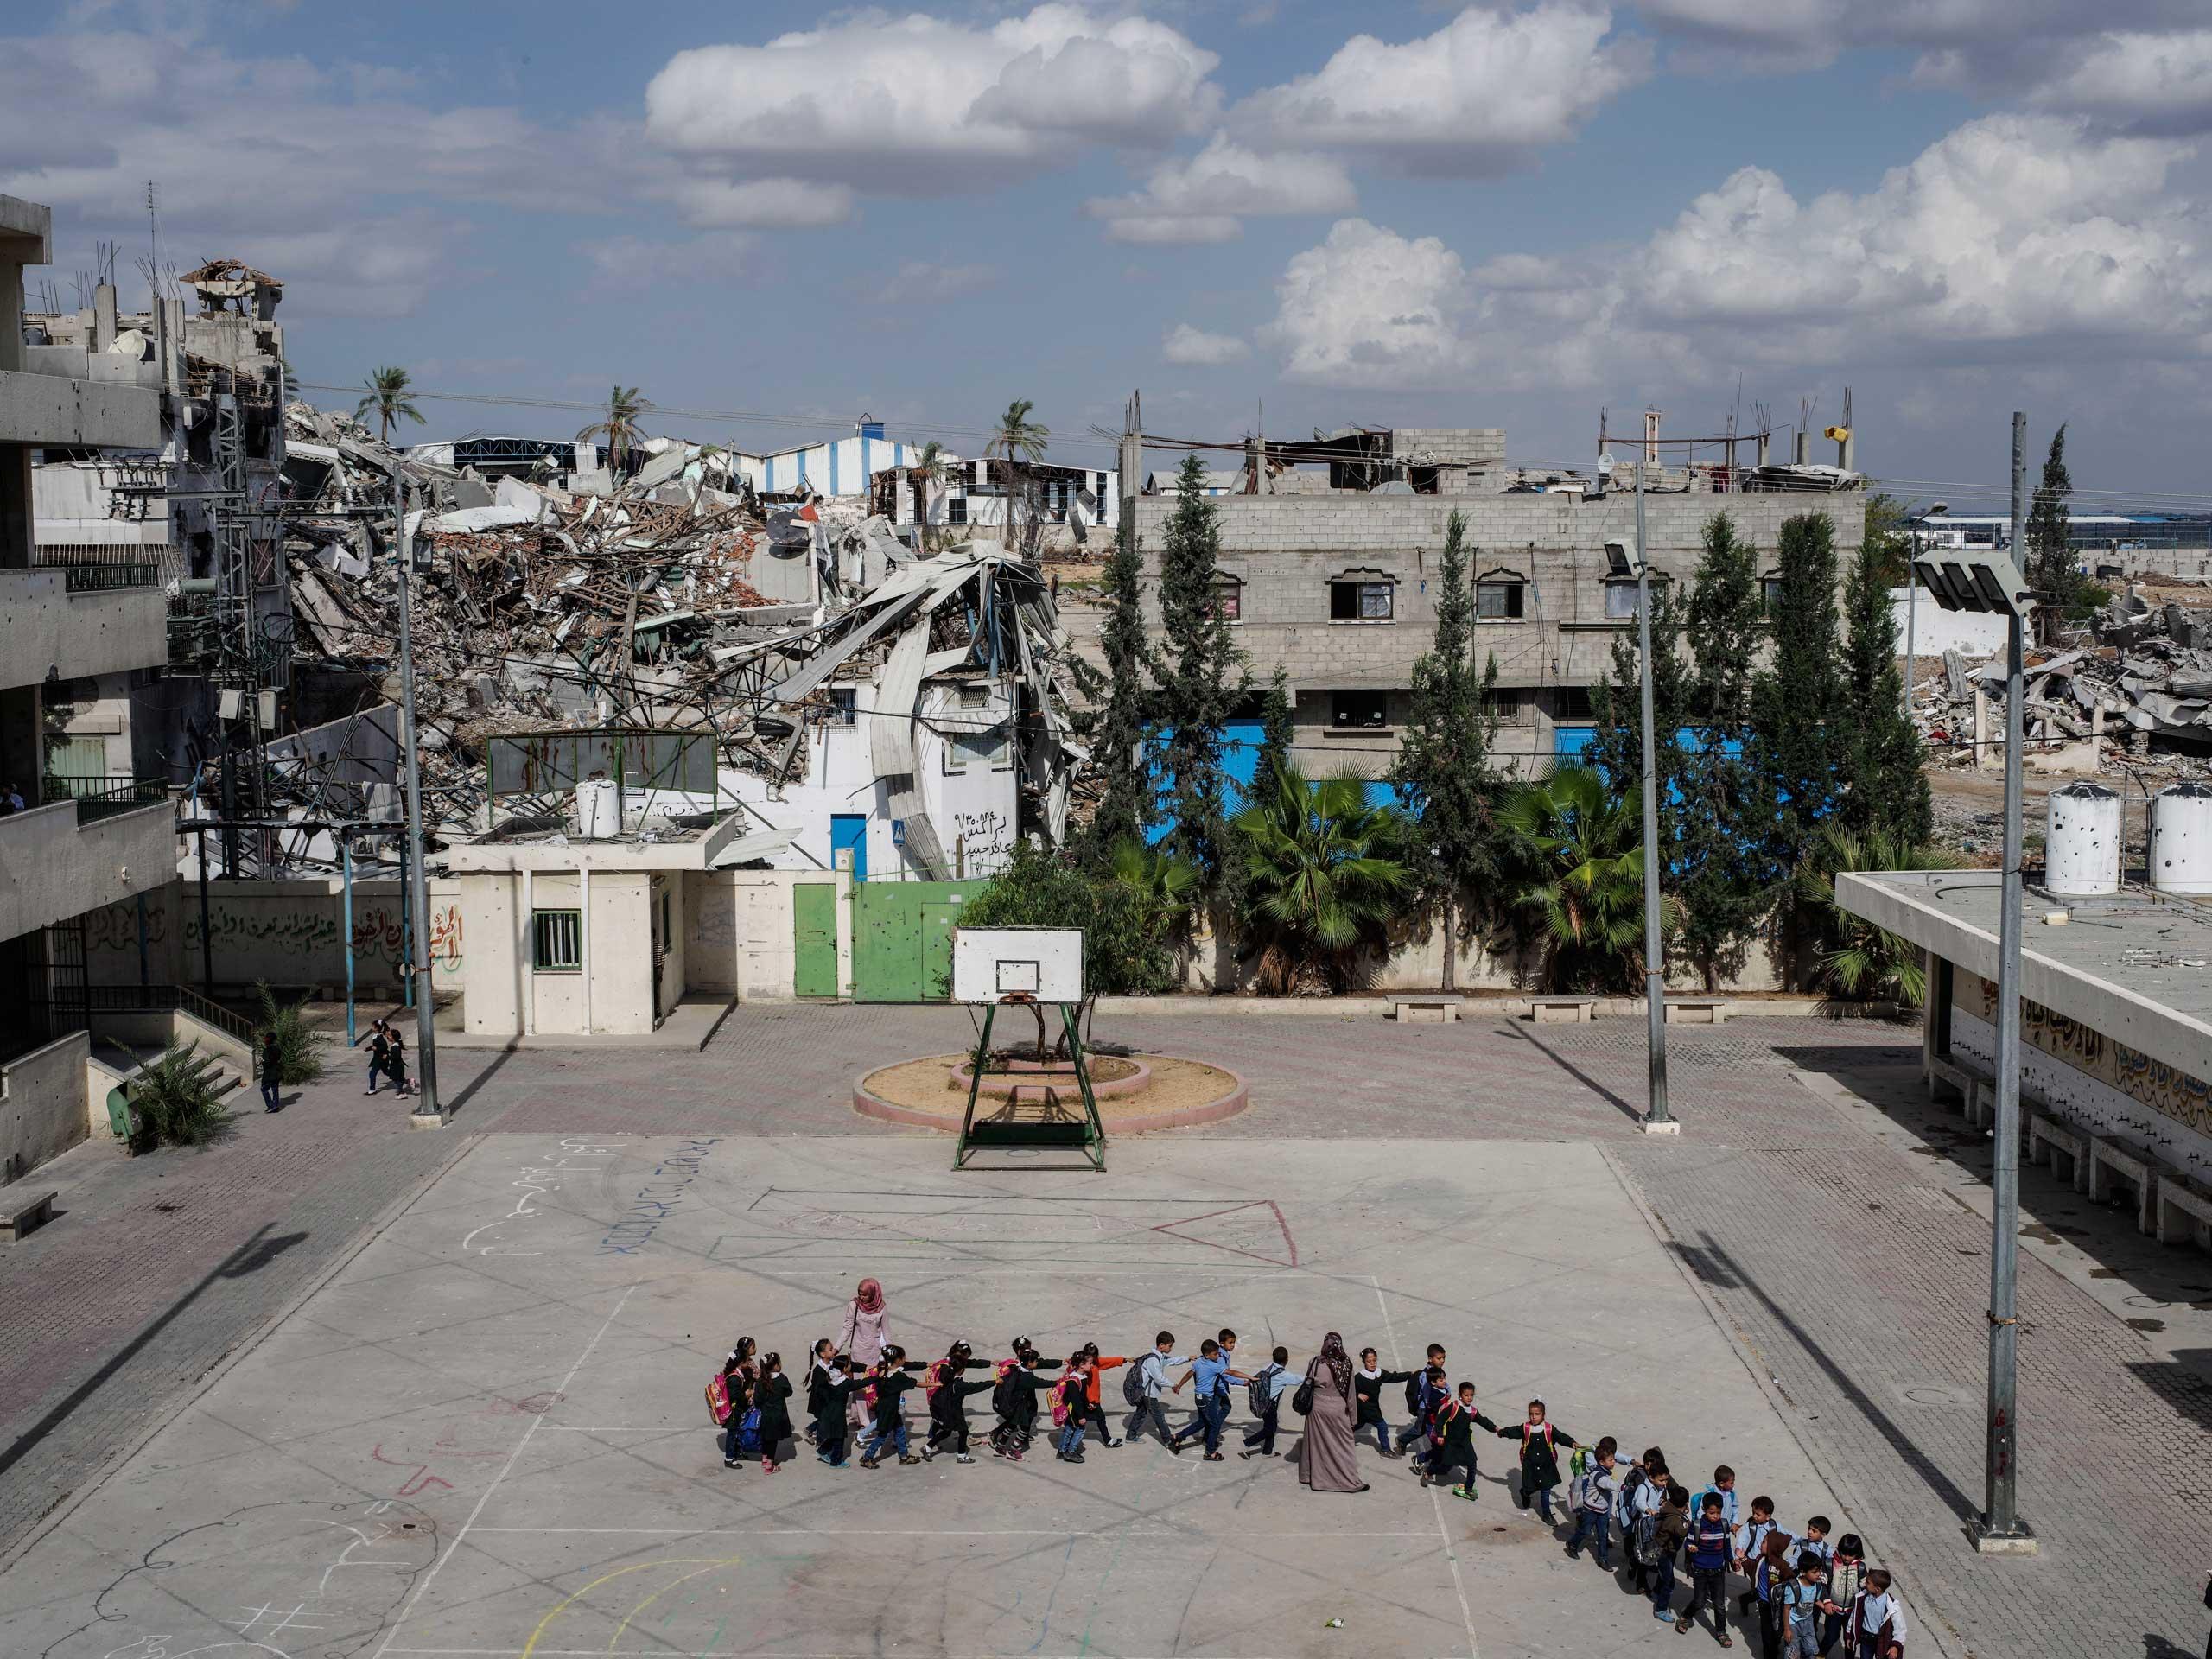 Schoolchildren head to class at the Sobhi Abu Karsh School in the Shujai'iya neighborhood of Gaza, Oct. 20, 2014.